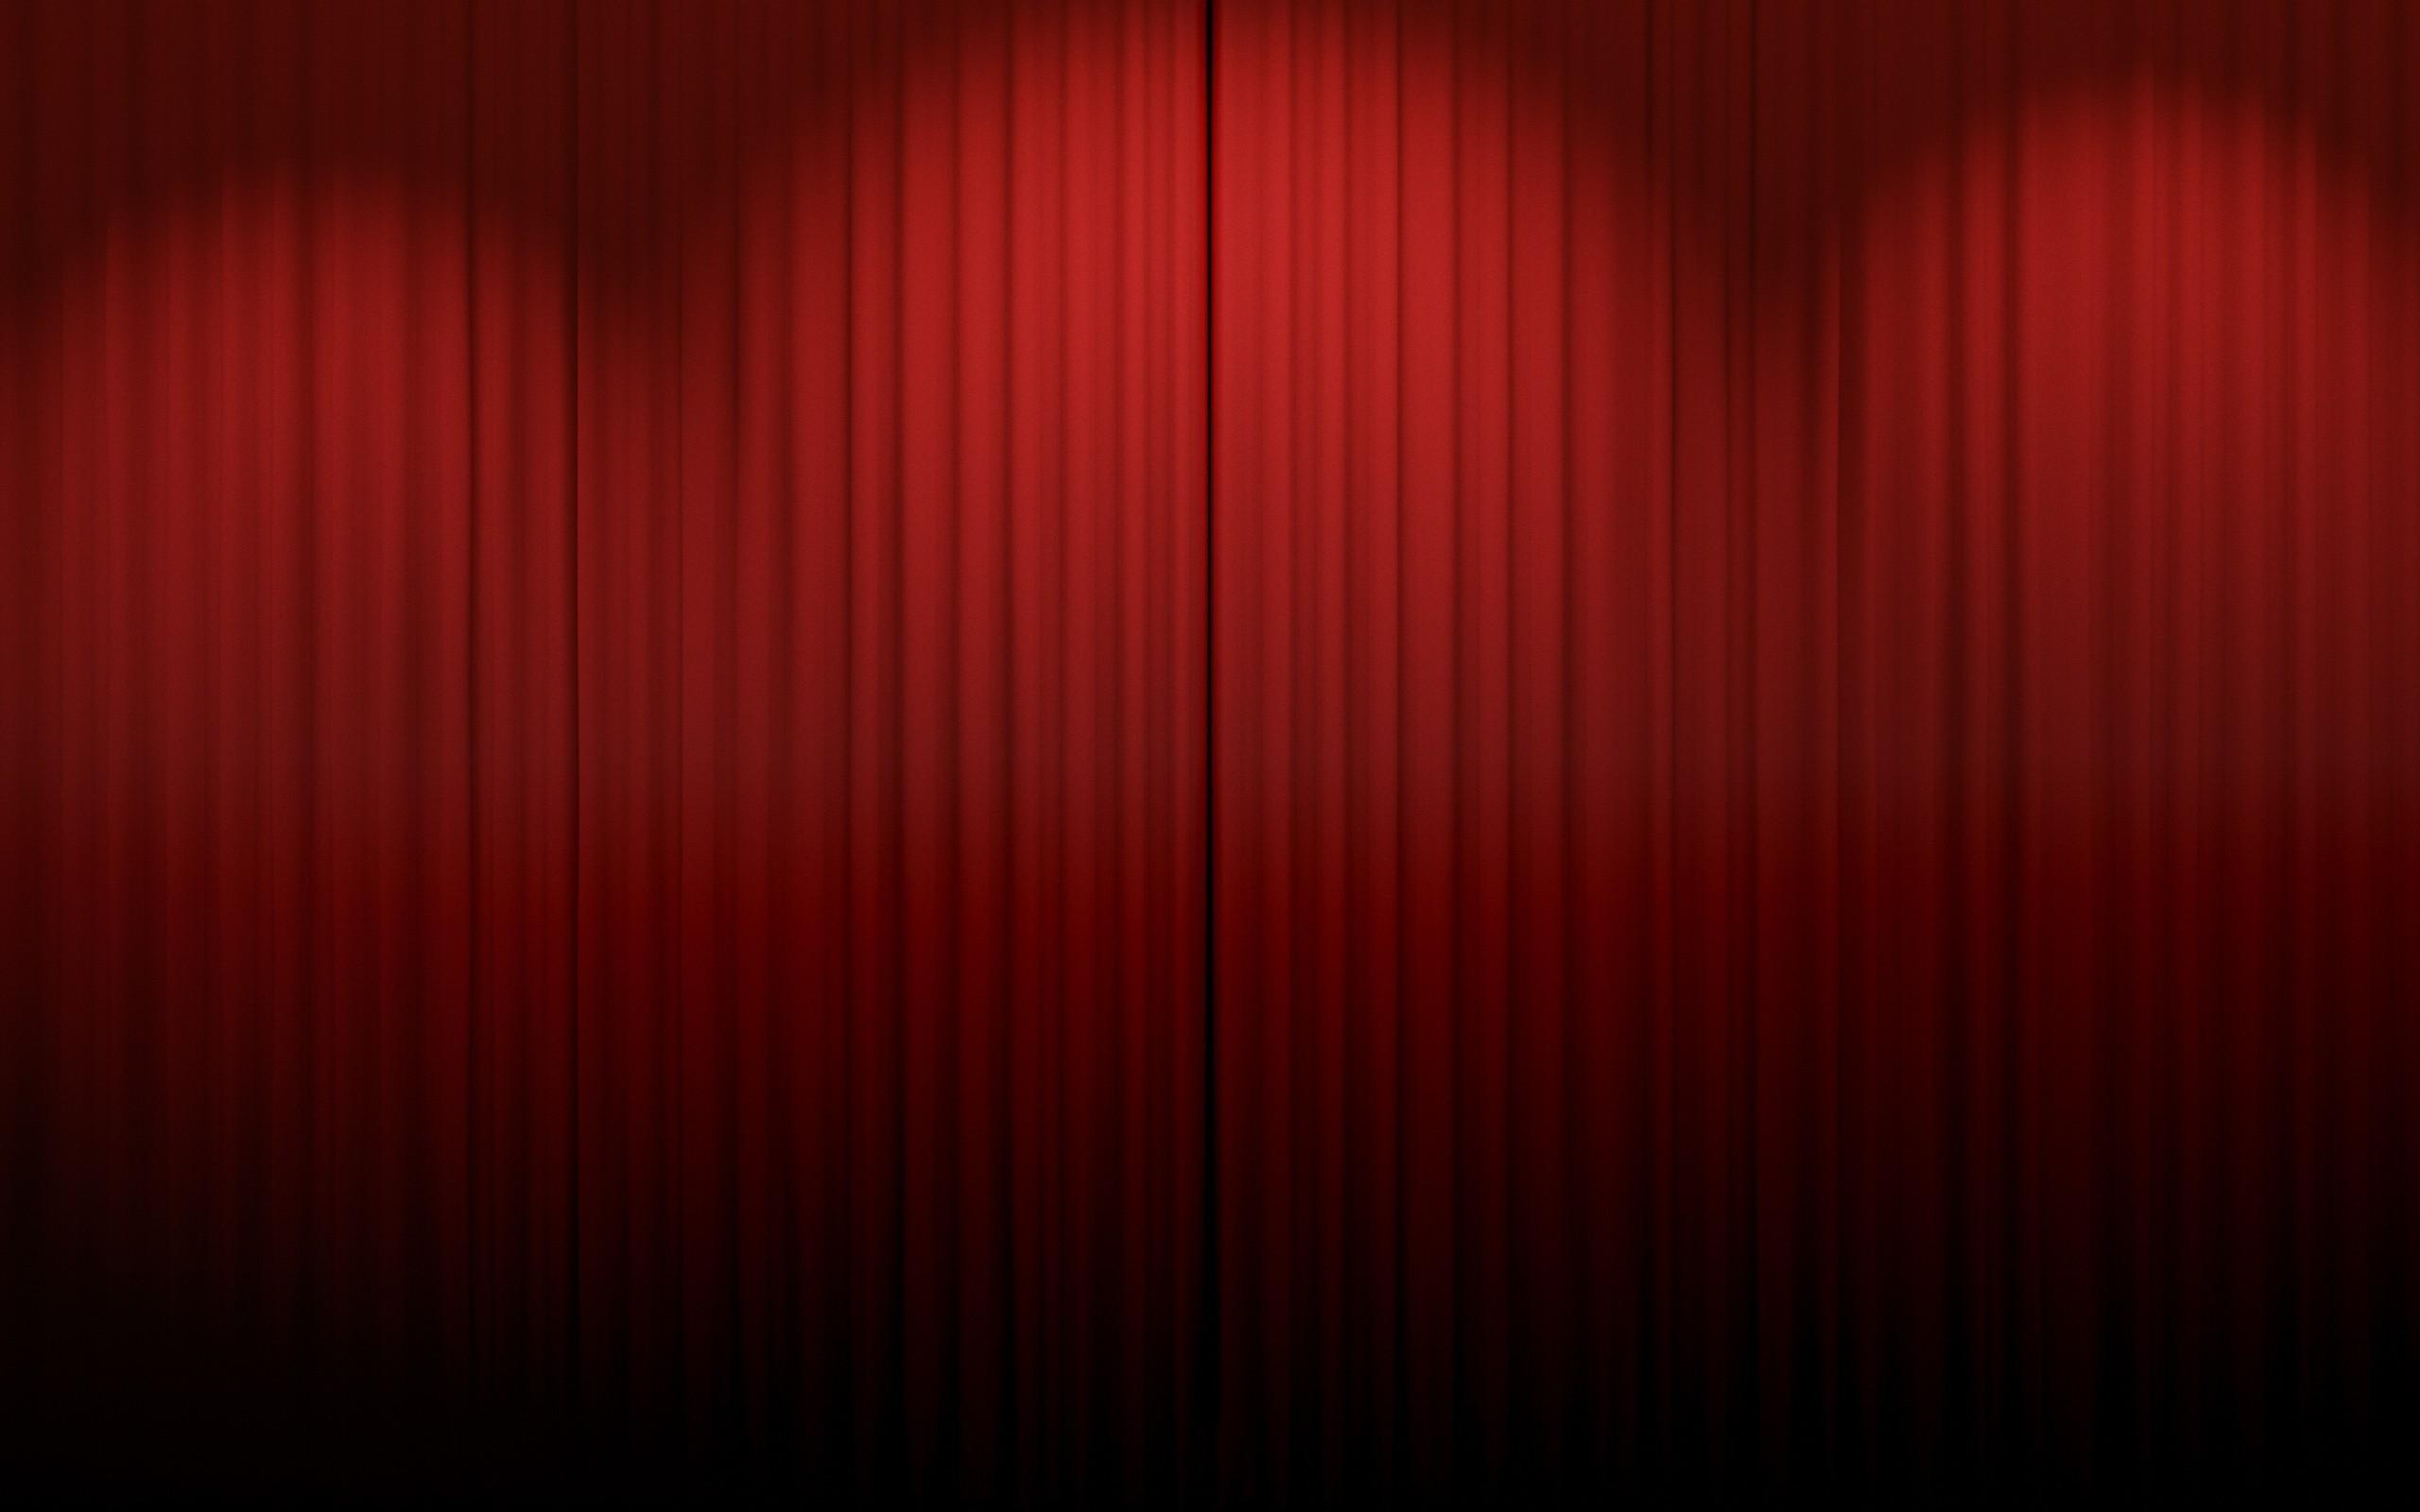 Stage Curtain Wallpaper Wallpapersafari